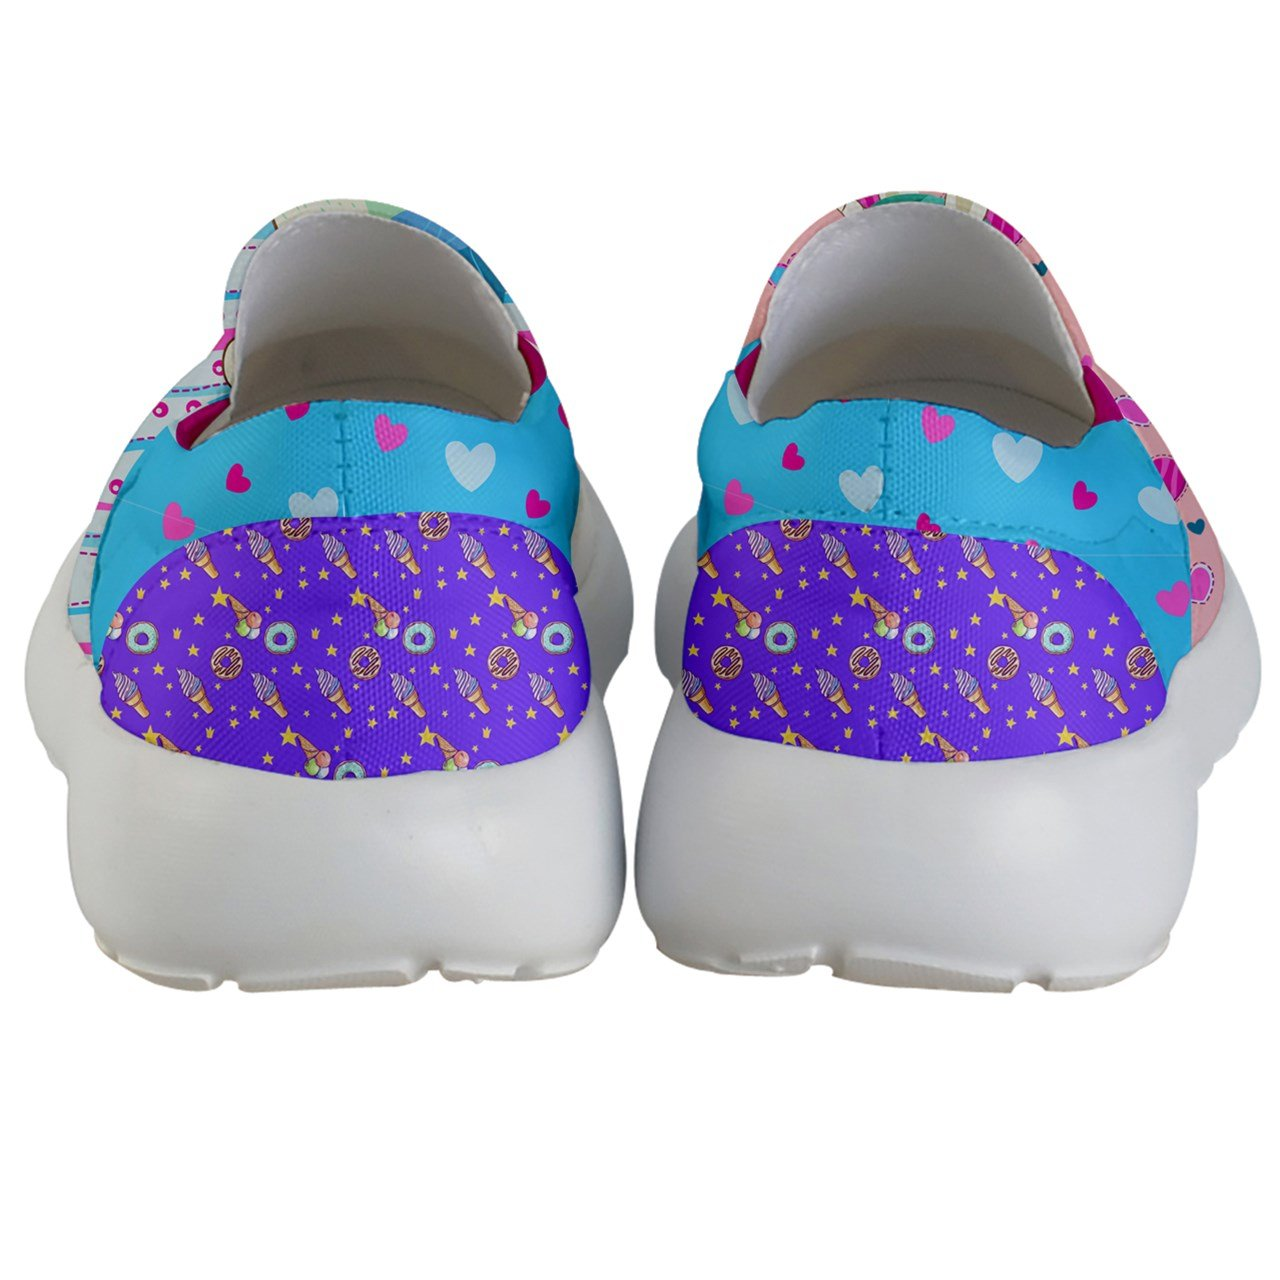 PattyCandy Girls Love Unicorn Prints Lightweight Slip On Shoes - US 2Y